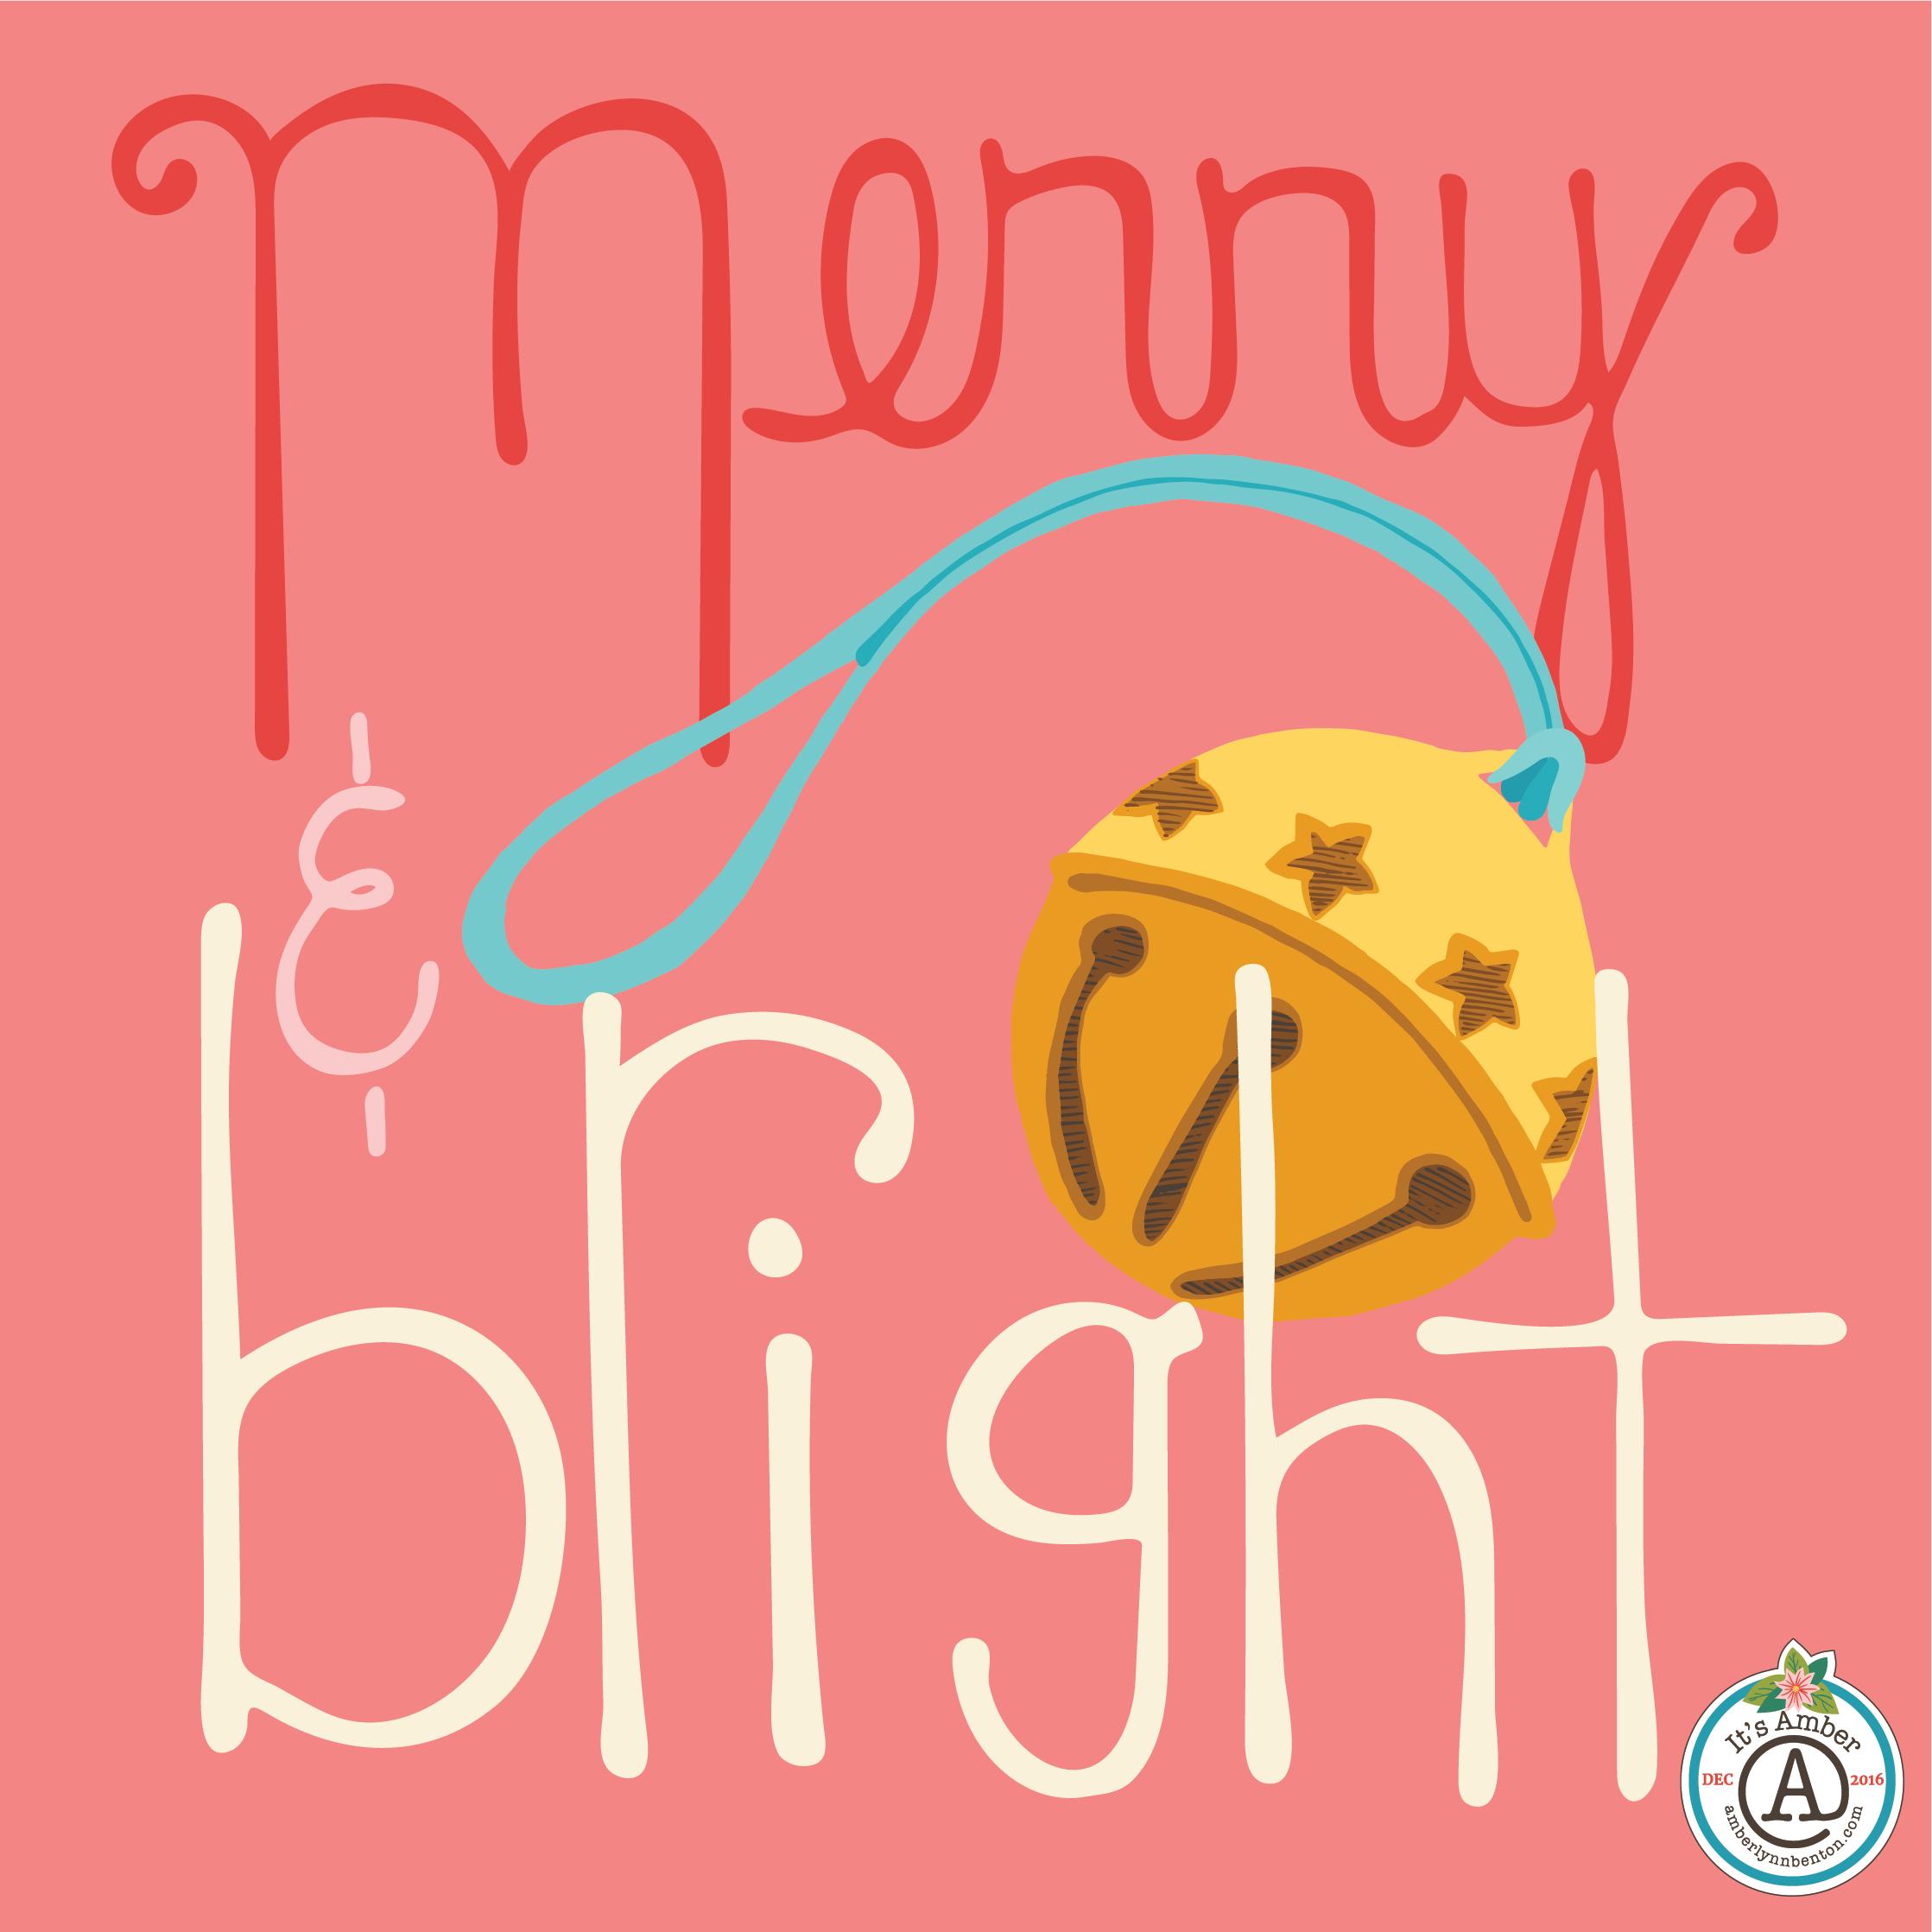 Merry & Bright by Amber Lynn Benton for #ItsAdvent2016